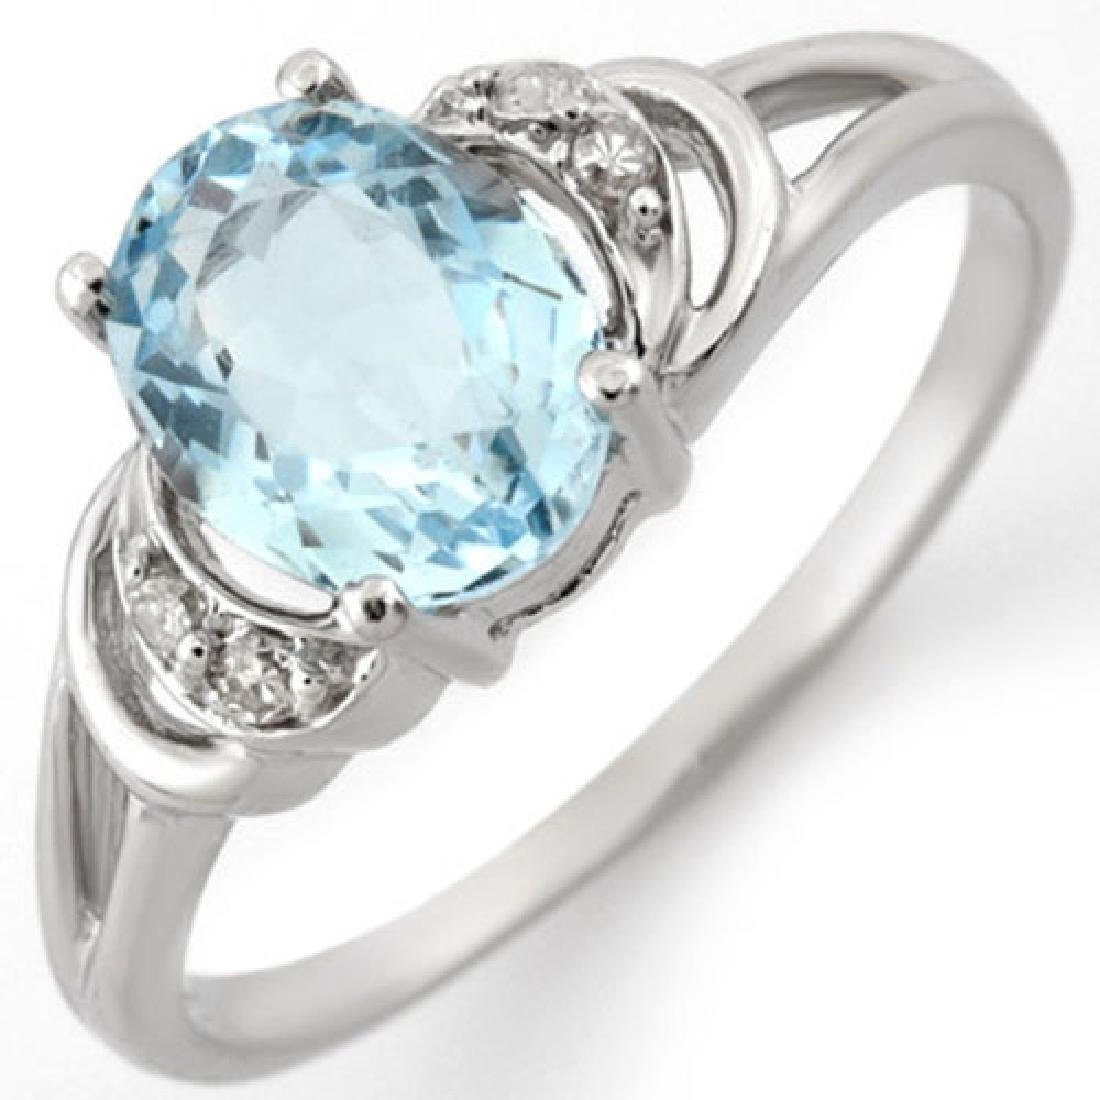 1.56 CTW Aquamarine & Diamond Ring 10K White Gold